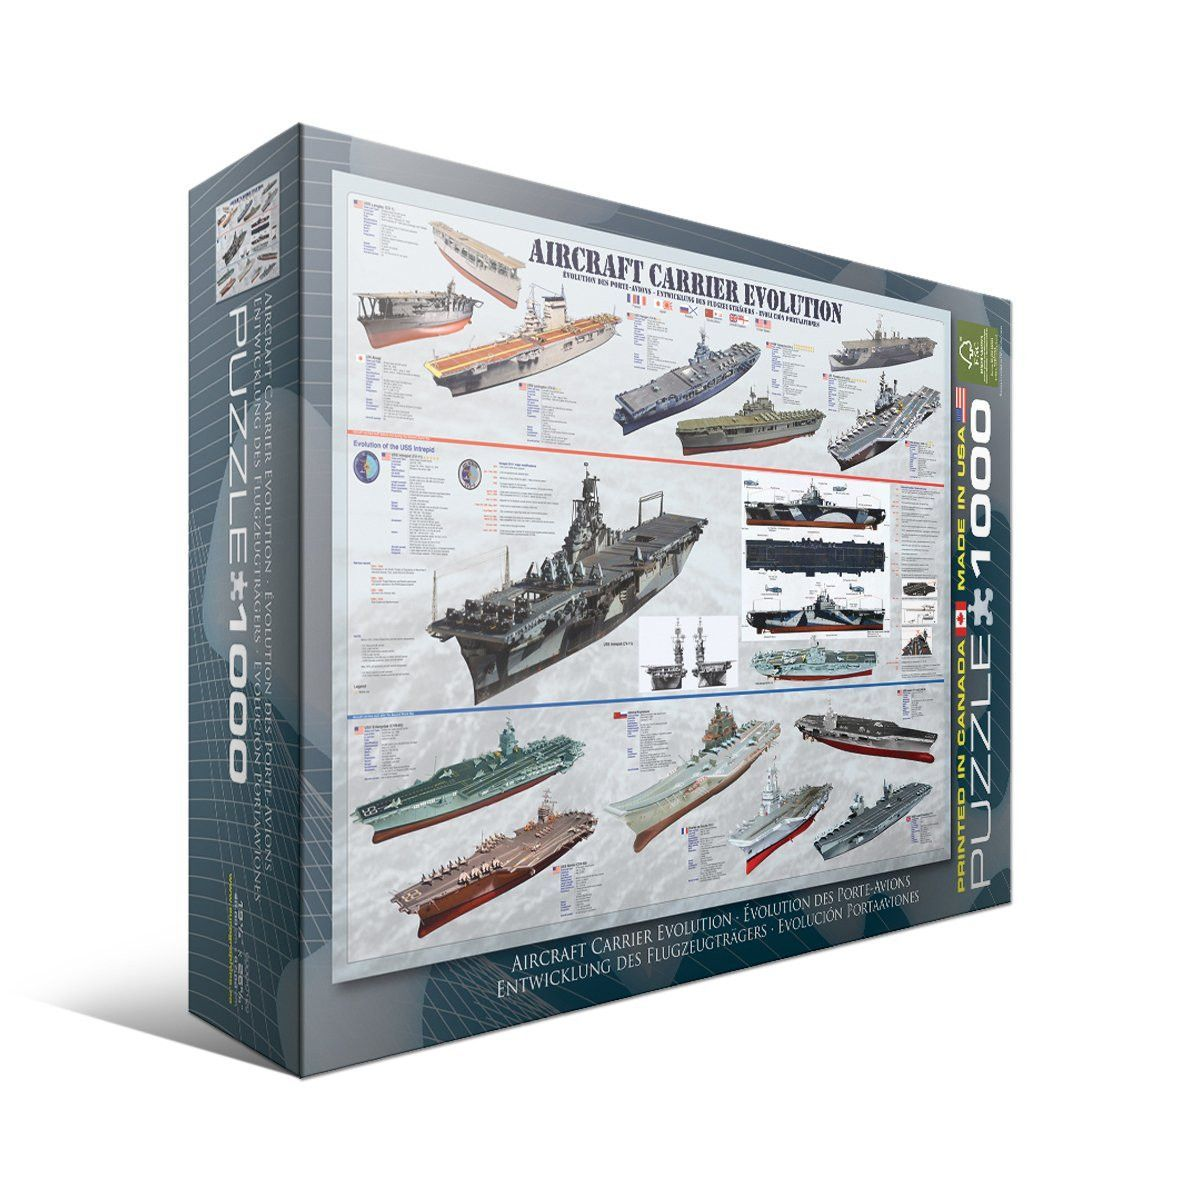 Aircraft Carrier Evolution - 1000pc Puzzle